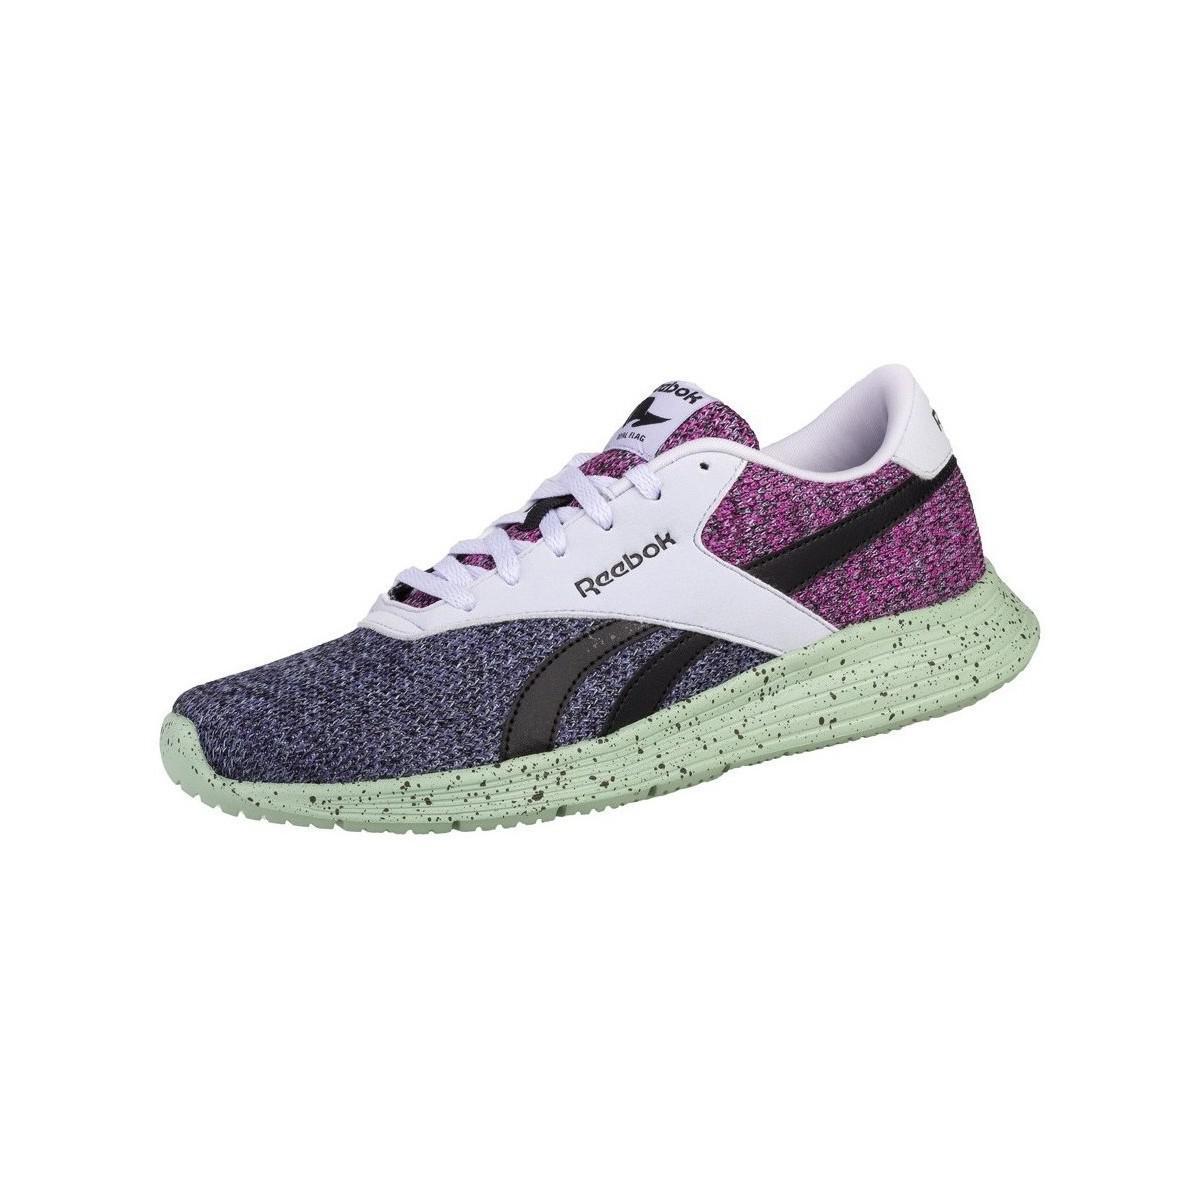 27307ad372c6 Reebok Royal Ec Ride Fs Women s Shoes (trainers) In Multicolour - Lyst